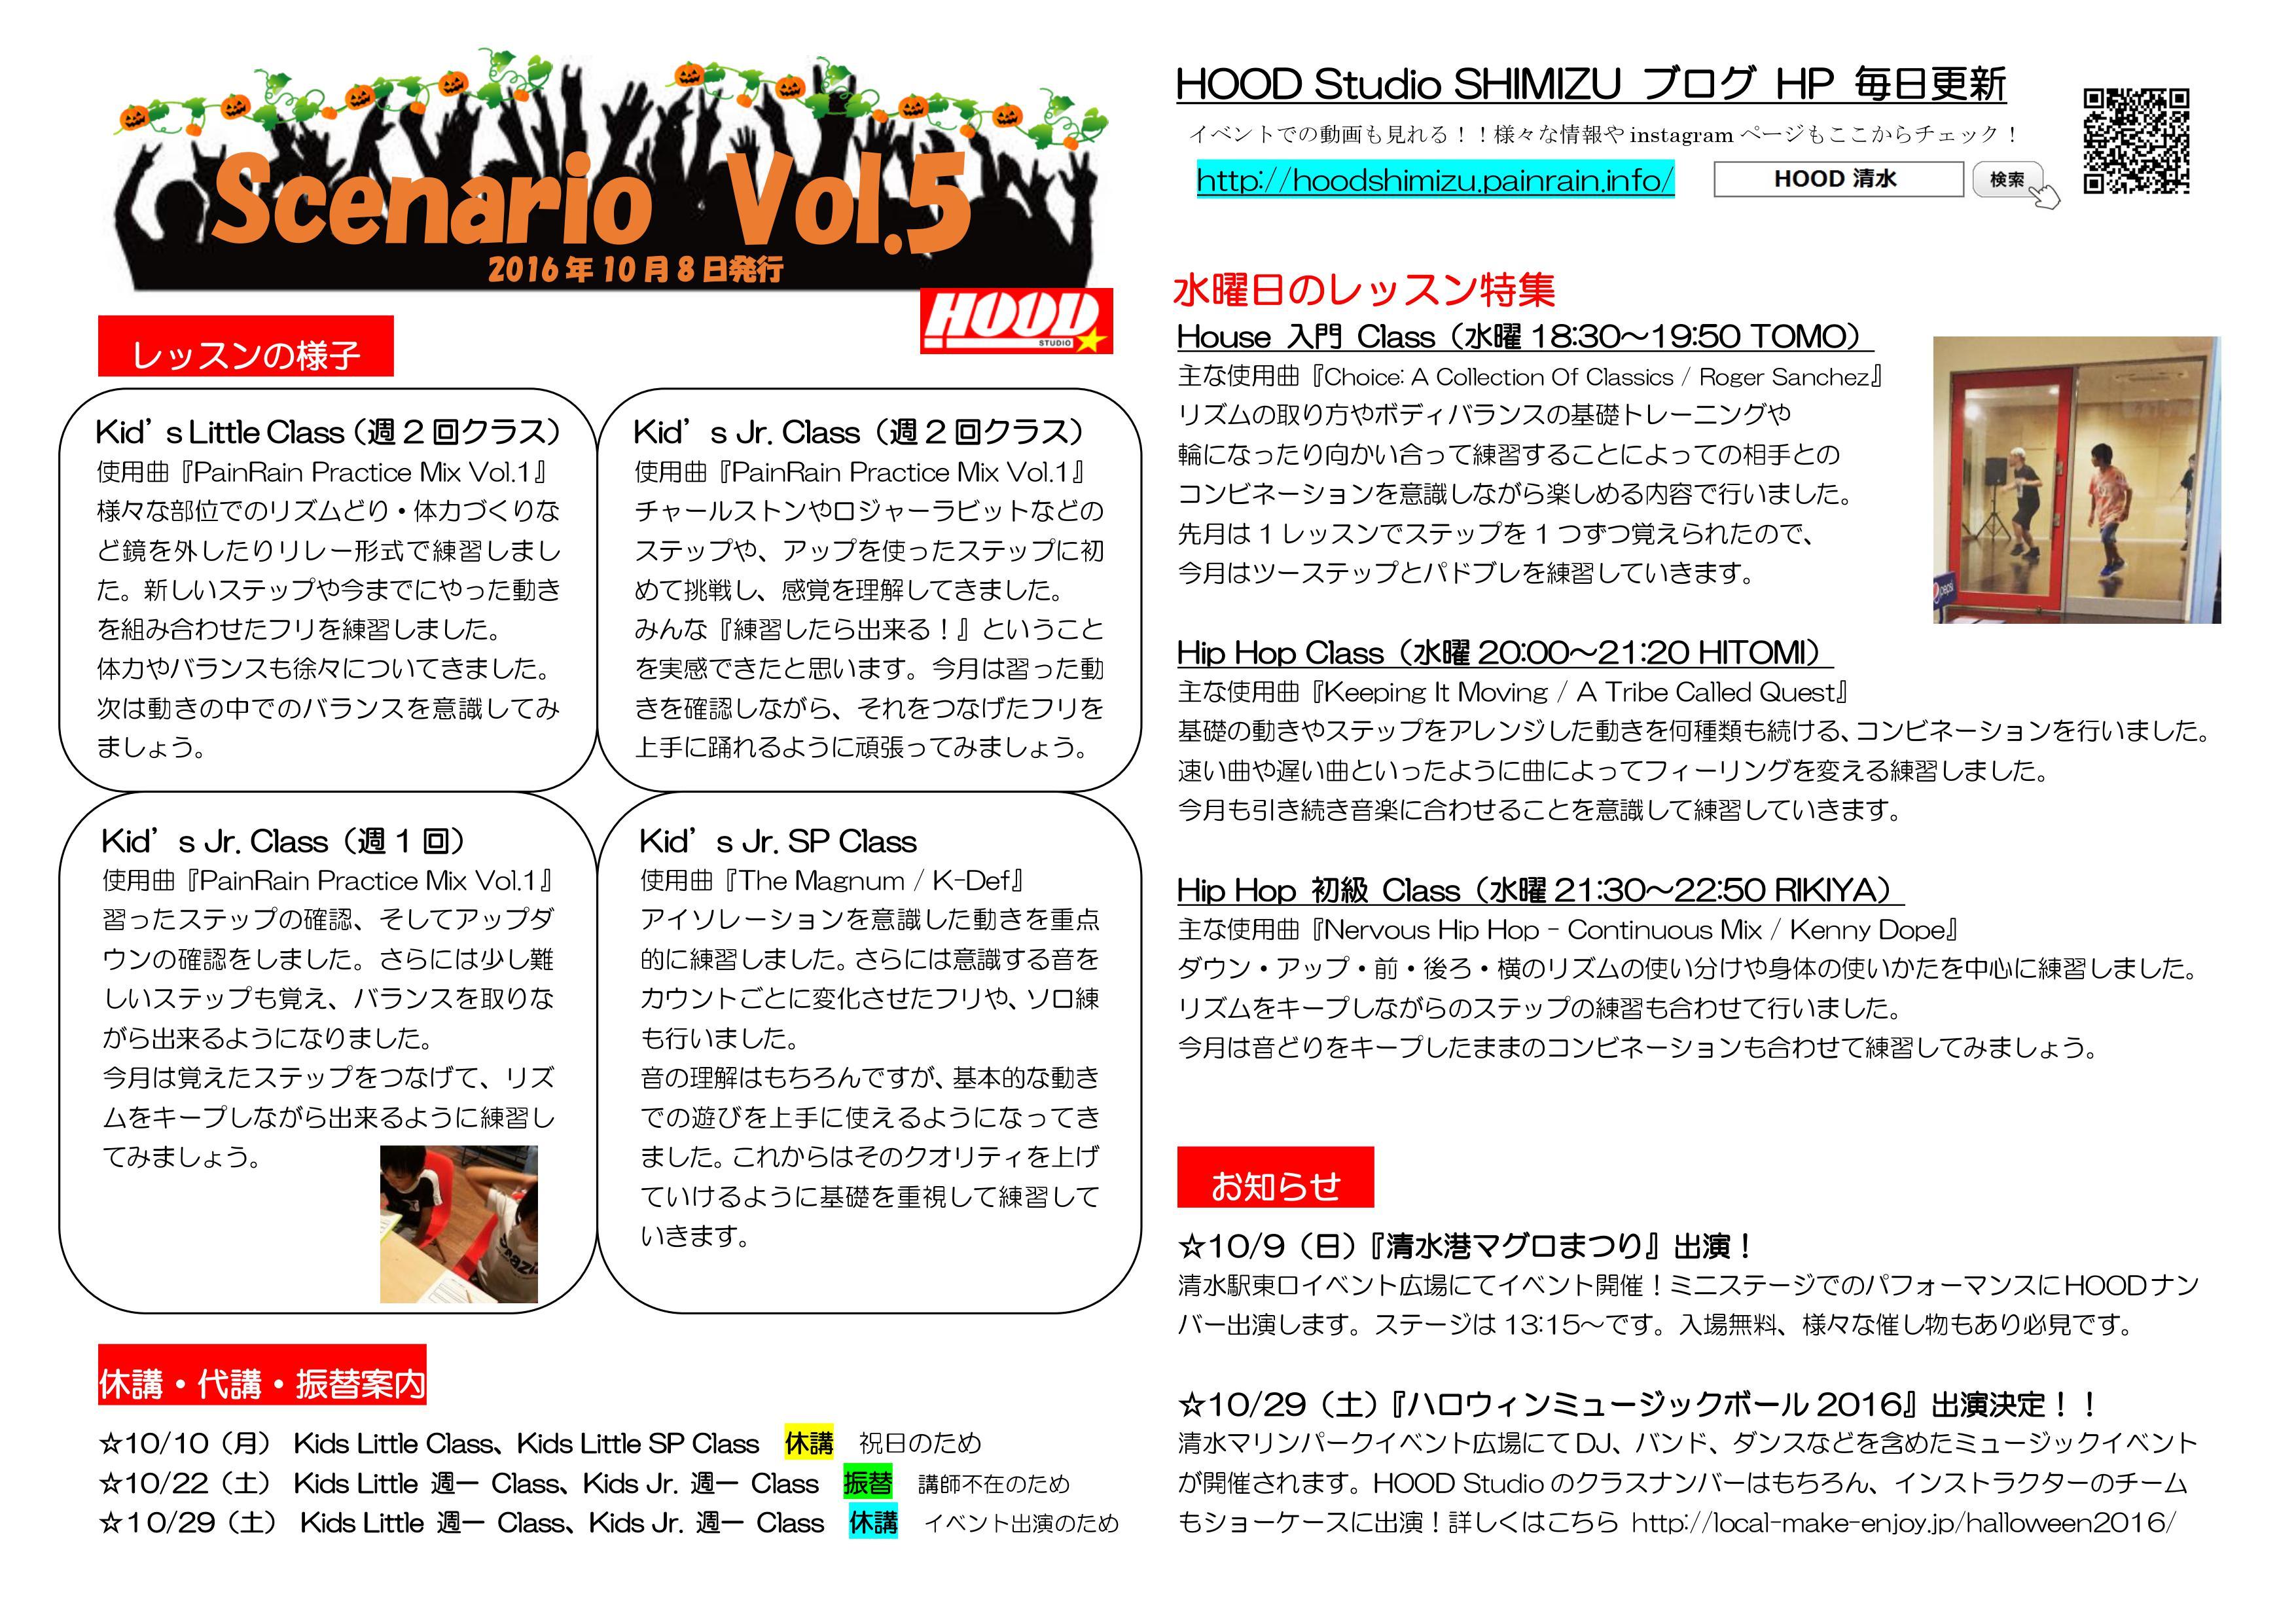 HOOD キッズダンス 清水区 ダンススタジオ Scenario Vol.5